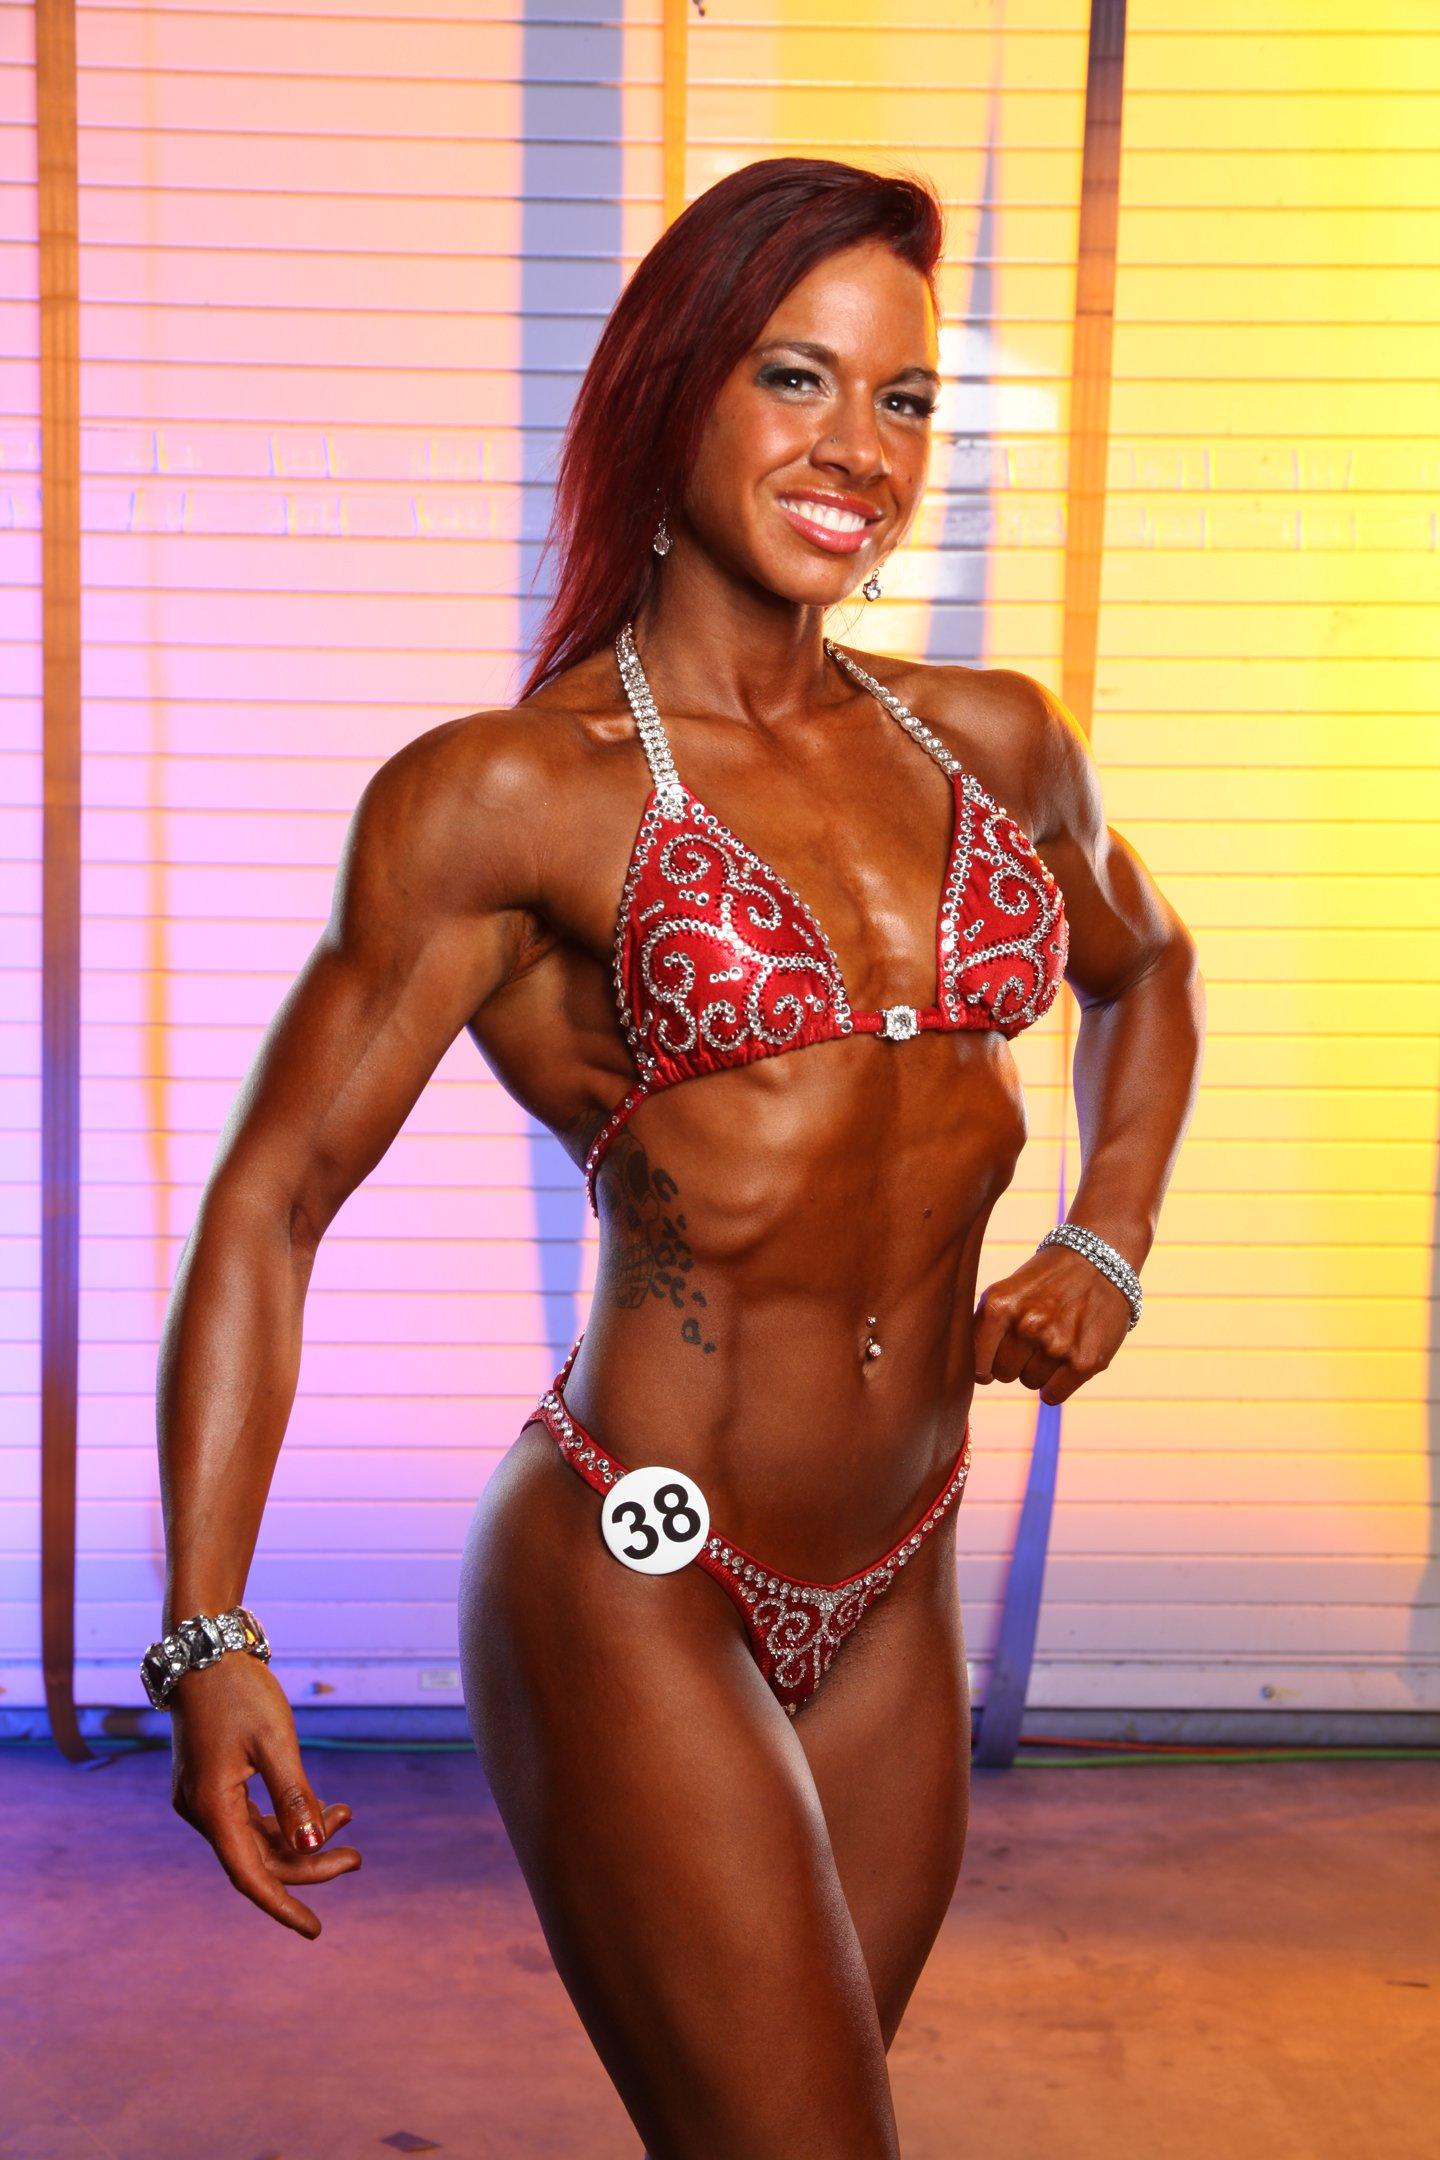 Ms Buffalo Figure, Callie Vanni